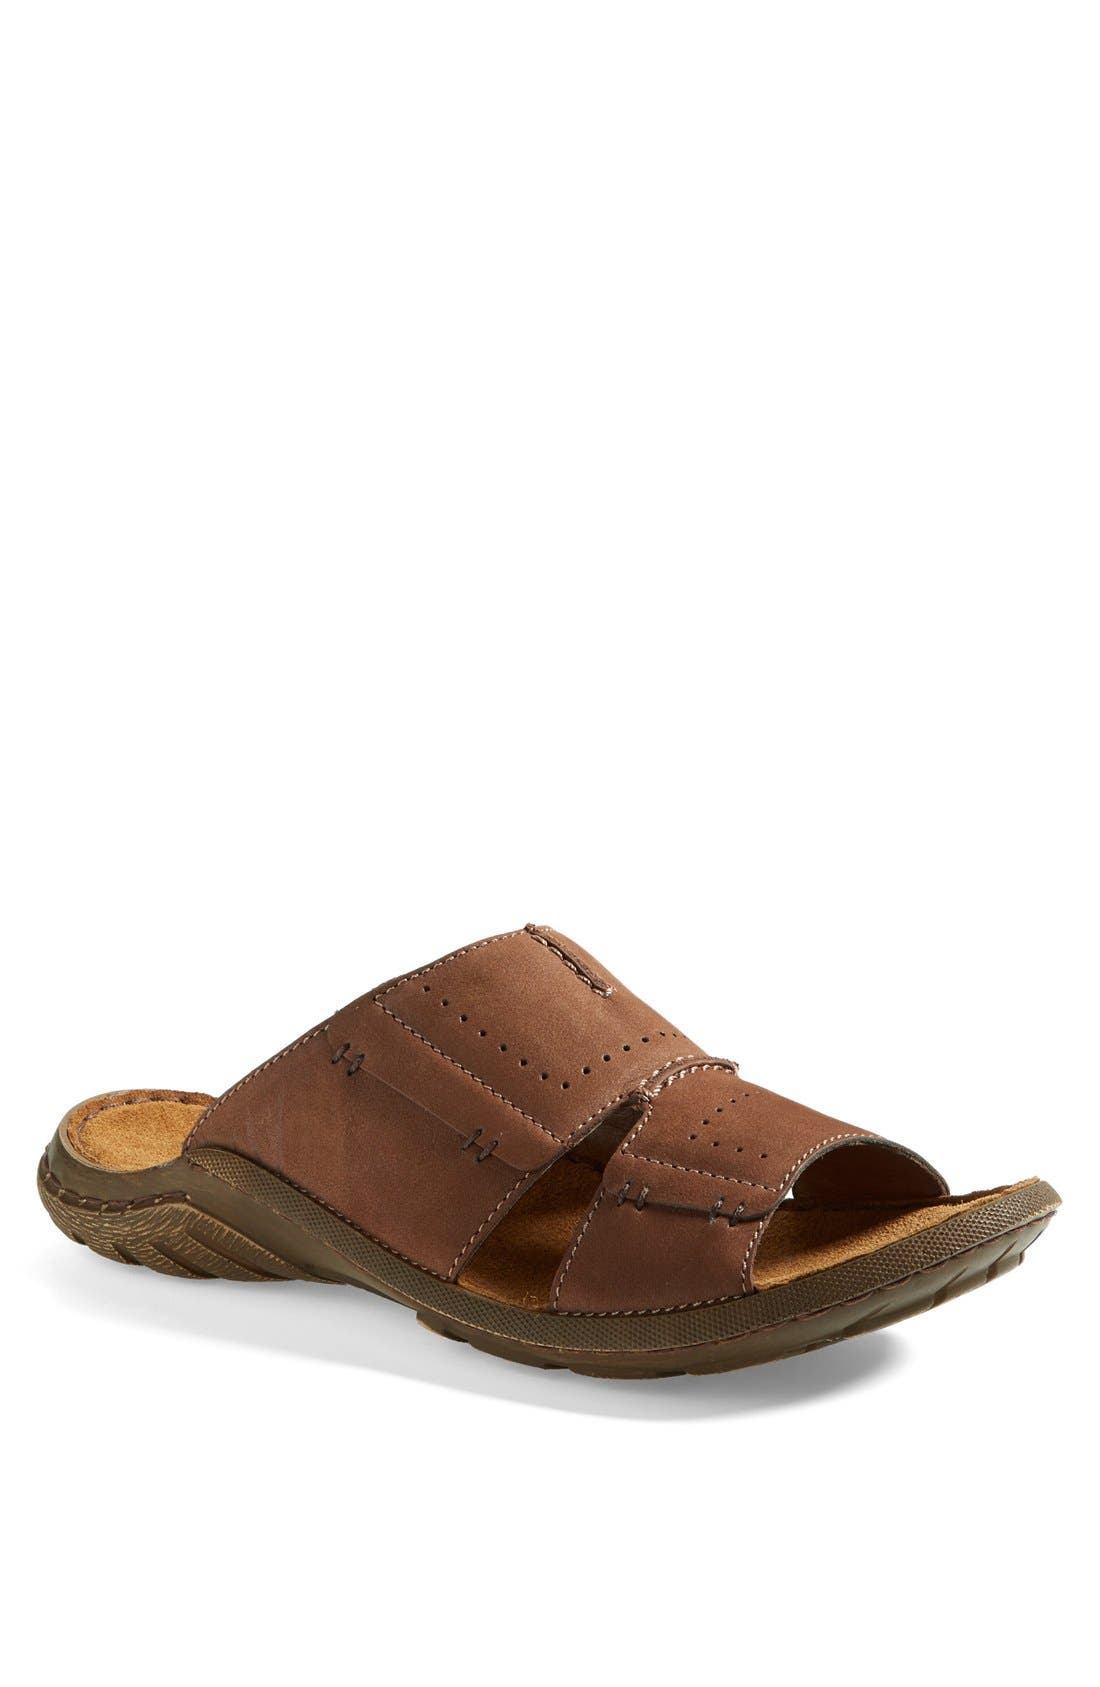 'Logan 21' Slide Sandal,                         Main,                         color, 241